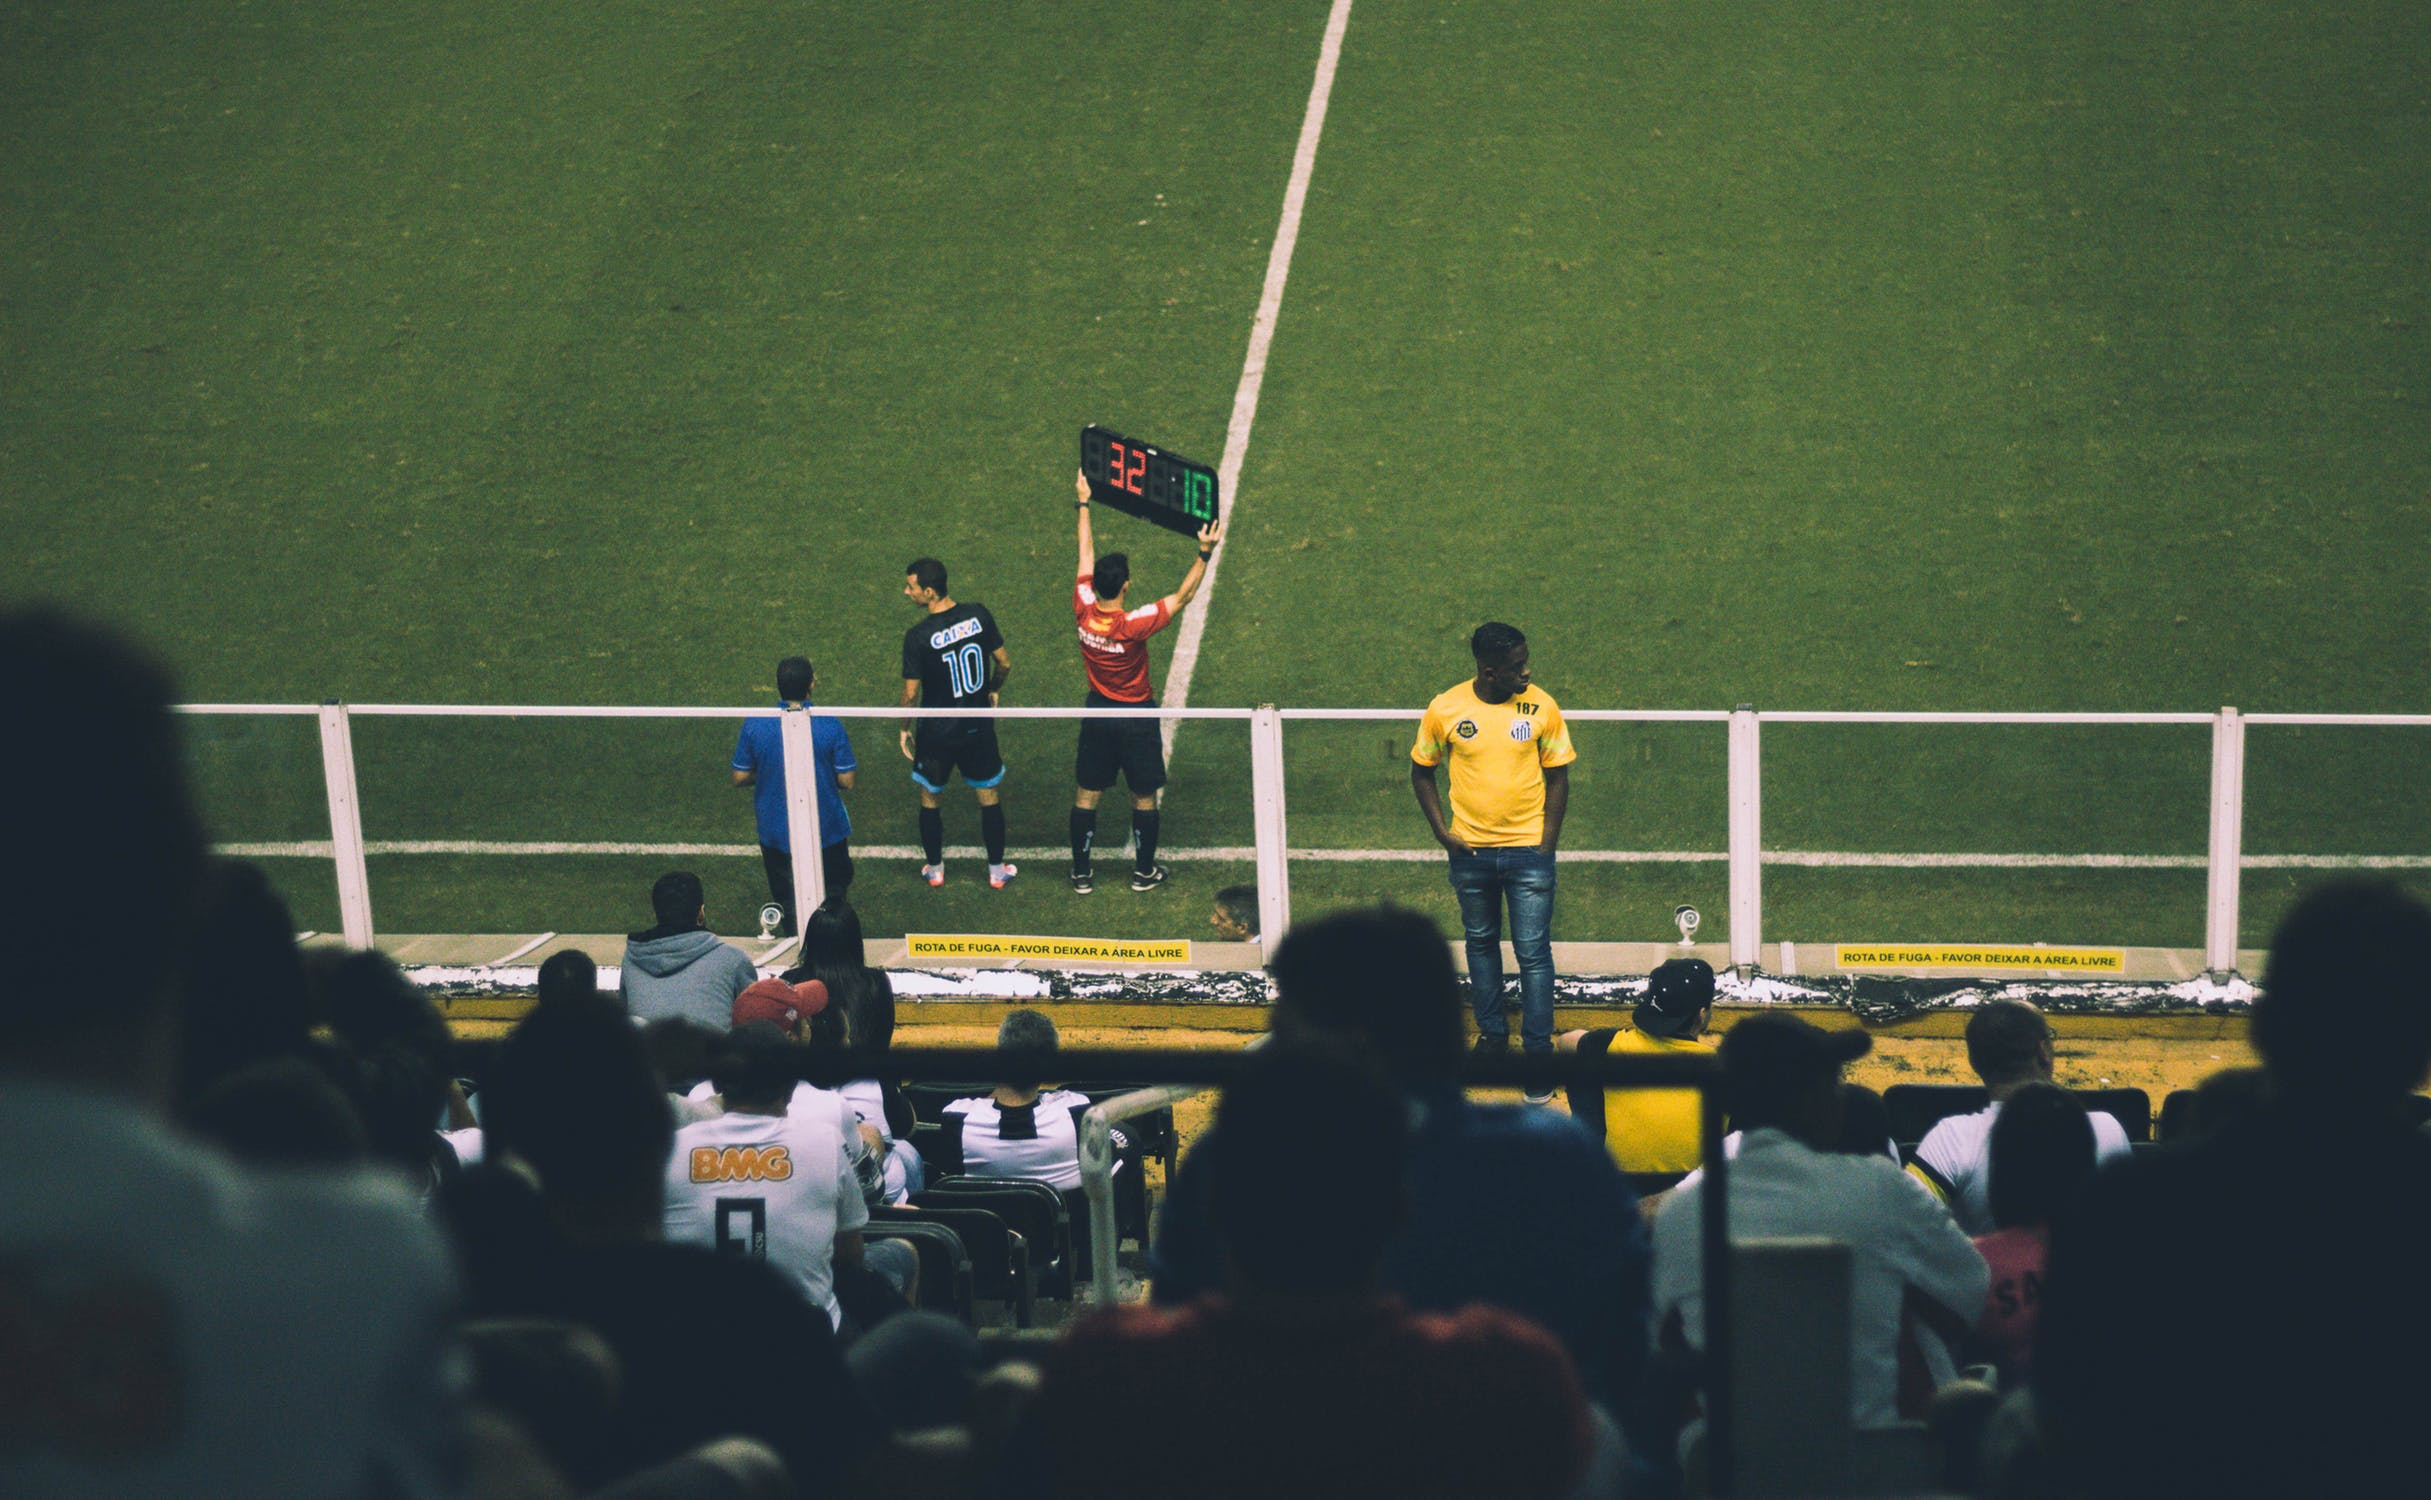 Elite Referee Assessments